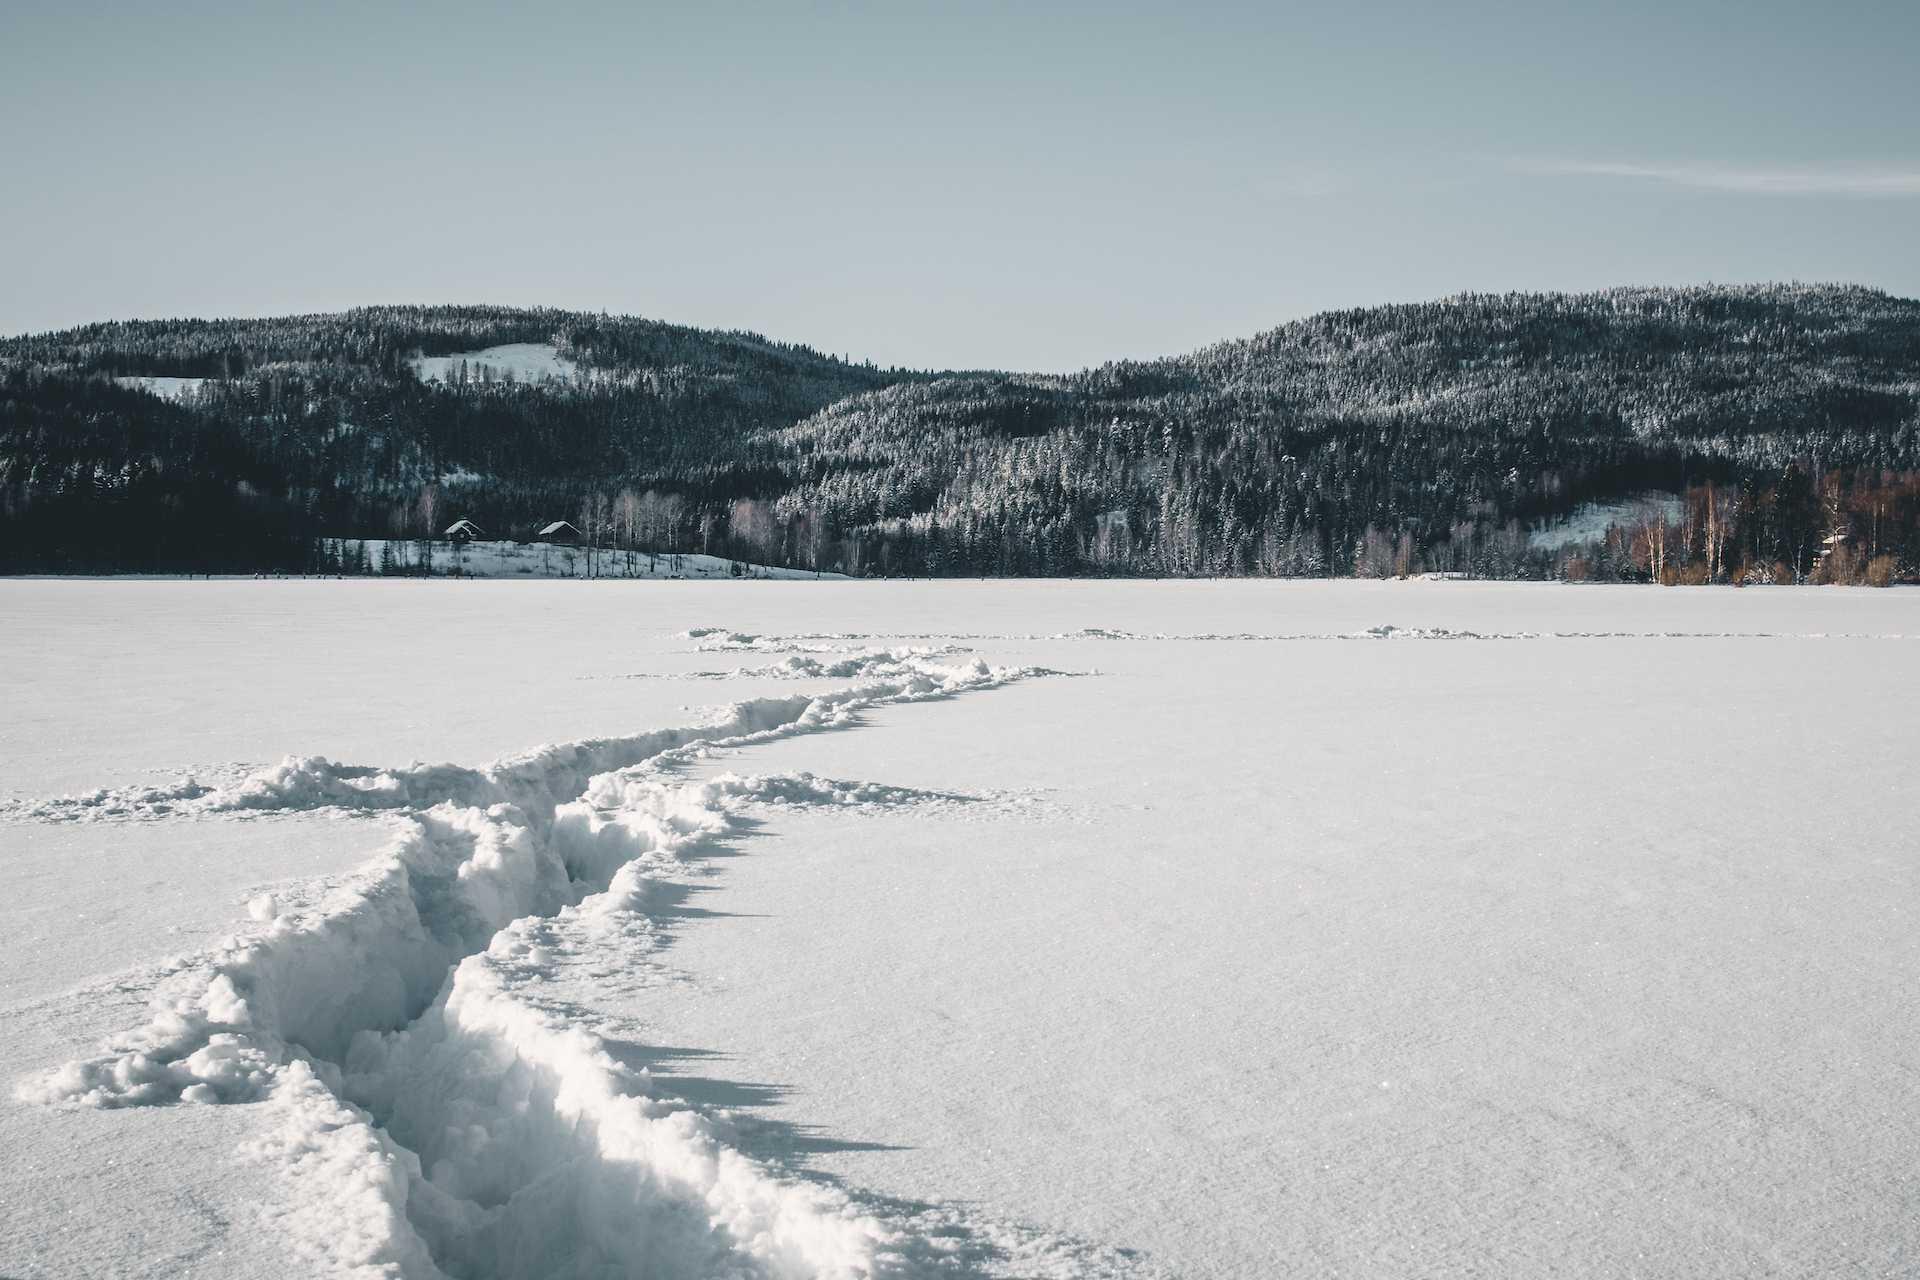 Góry wokolicach Oslo